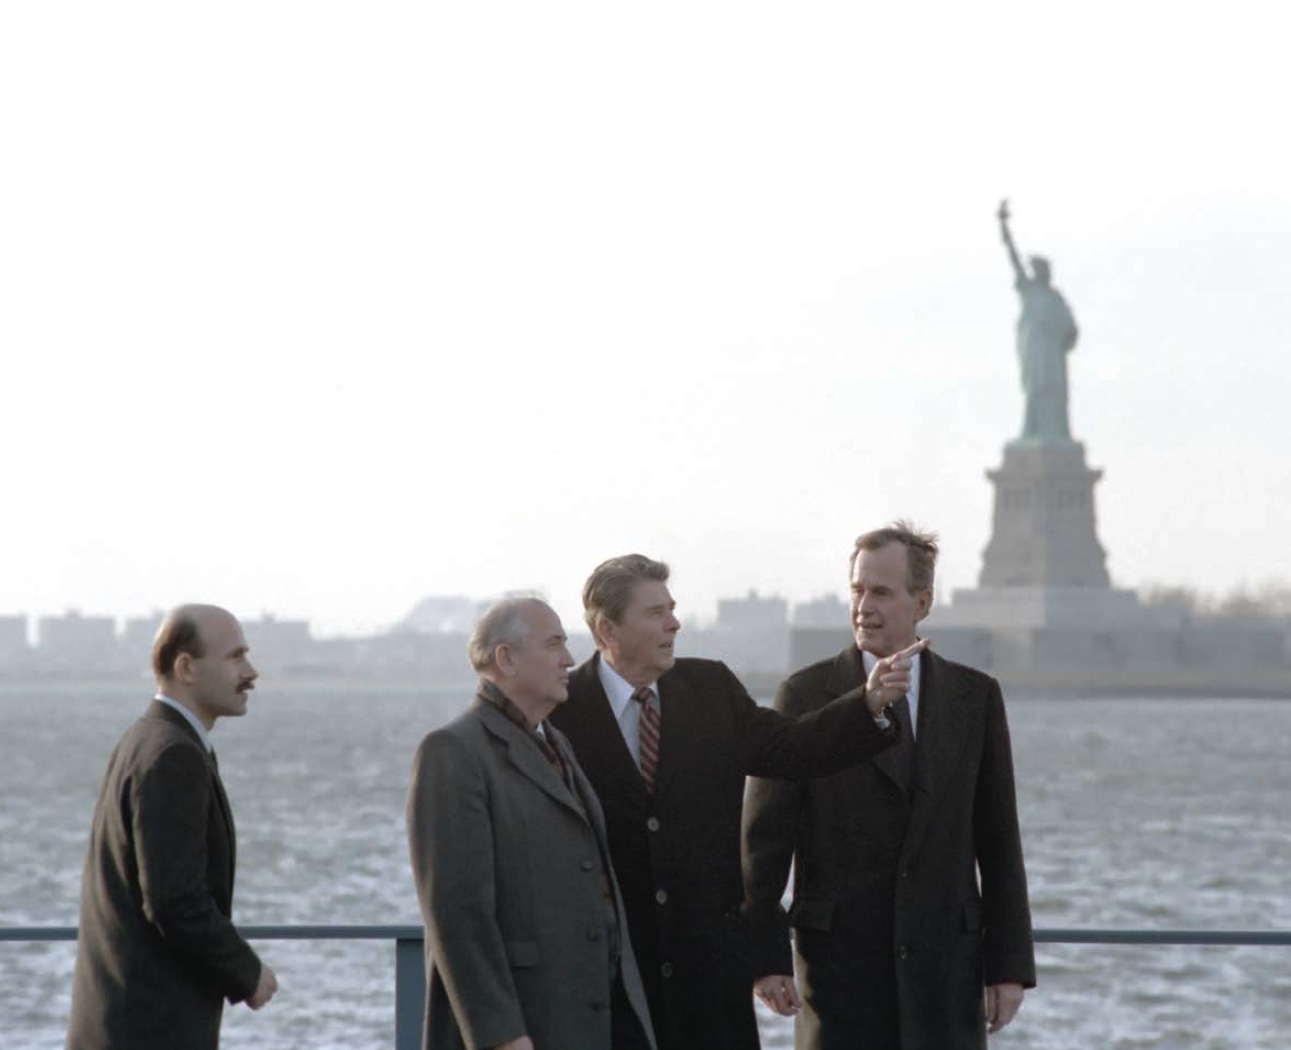 President Reagan, Vice-President Bush meet with Soviet General Secretary Gorbachev on Governor's Island, New York 12/7/88.